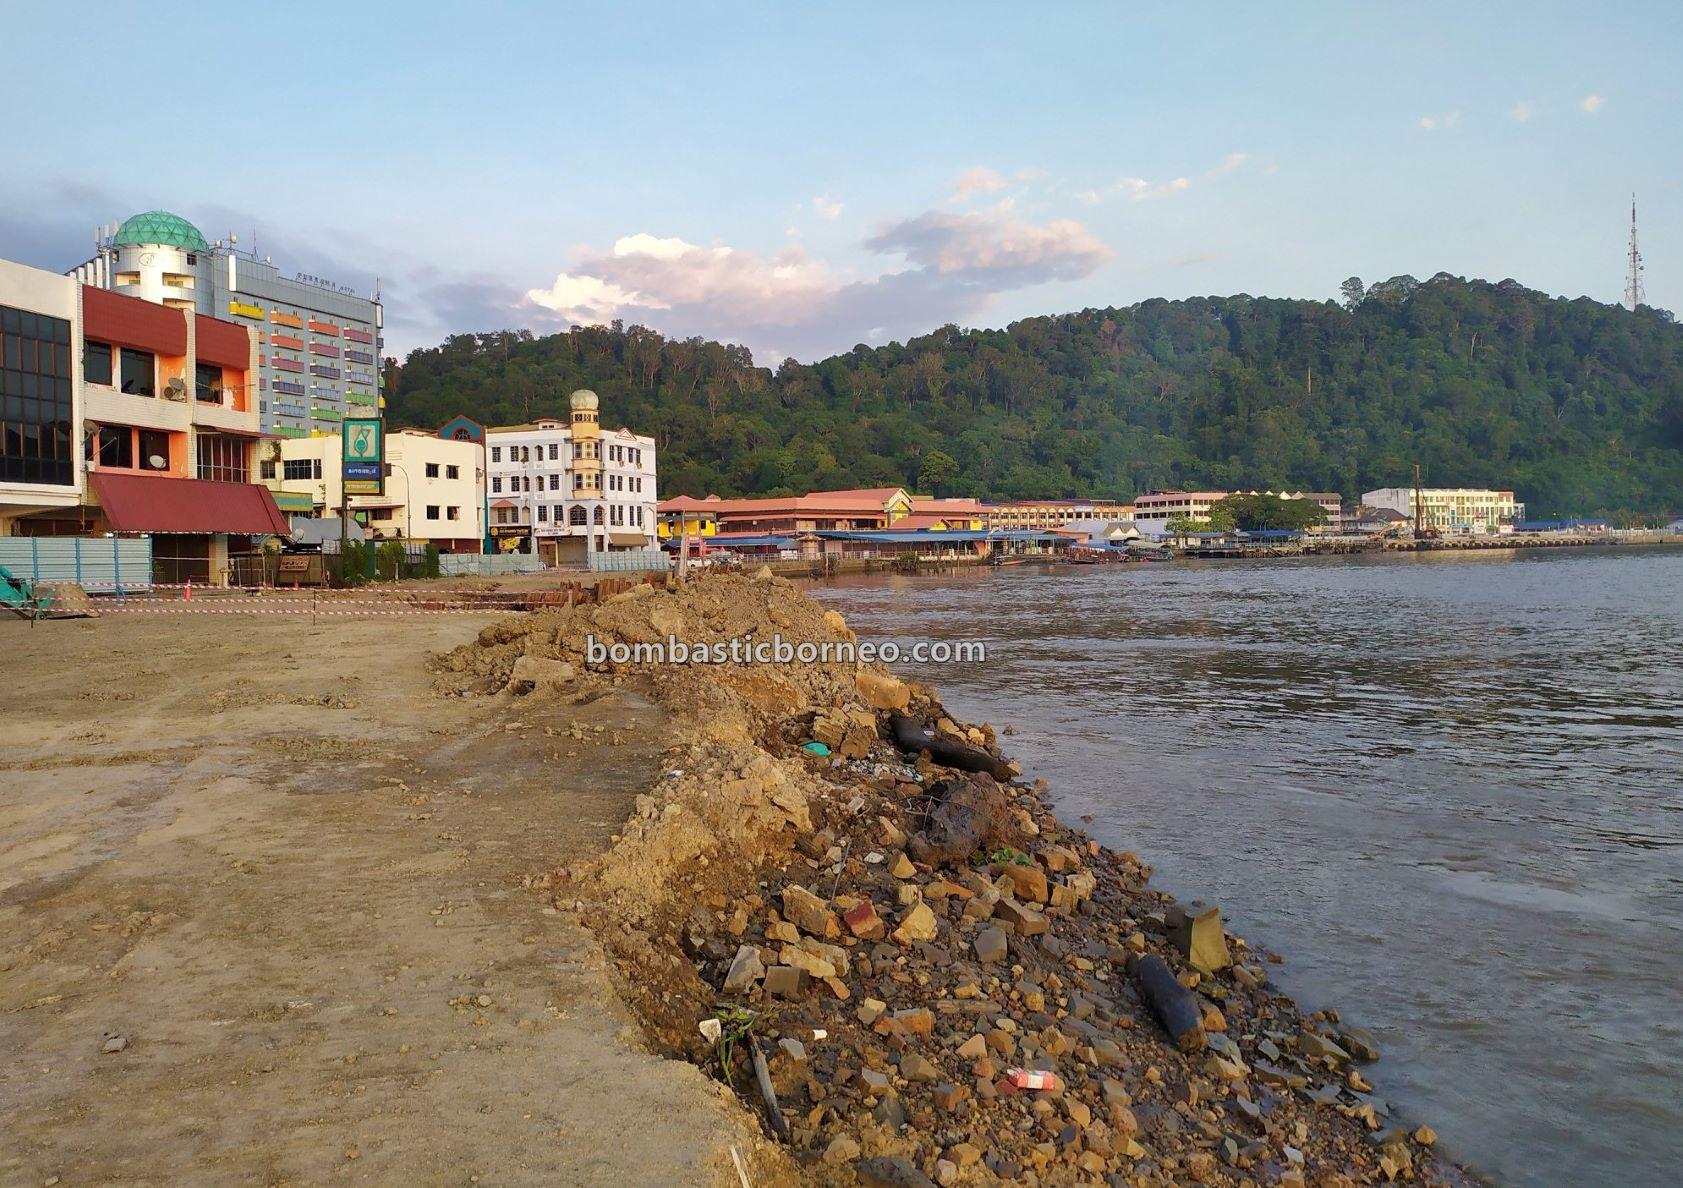 tarikan pelancong, town, backpackers, destination, exploration, Tourism, tourist attraction, Cross Border, Borneo, 探索婆罗洲游踪, 马来西亚砂拉越林梦